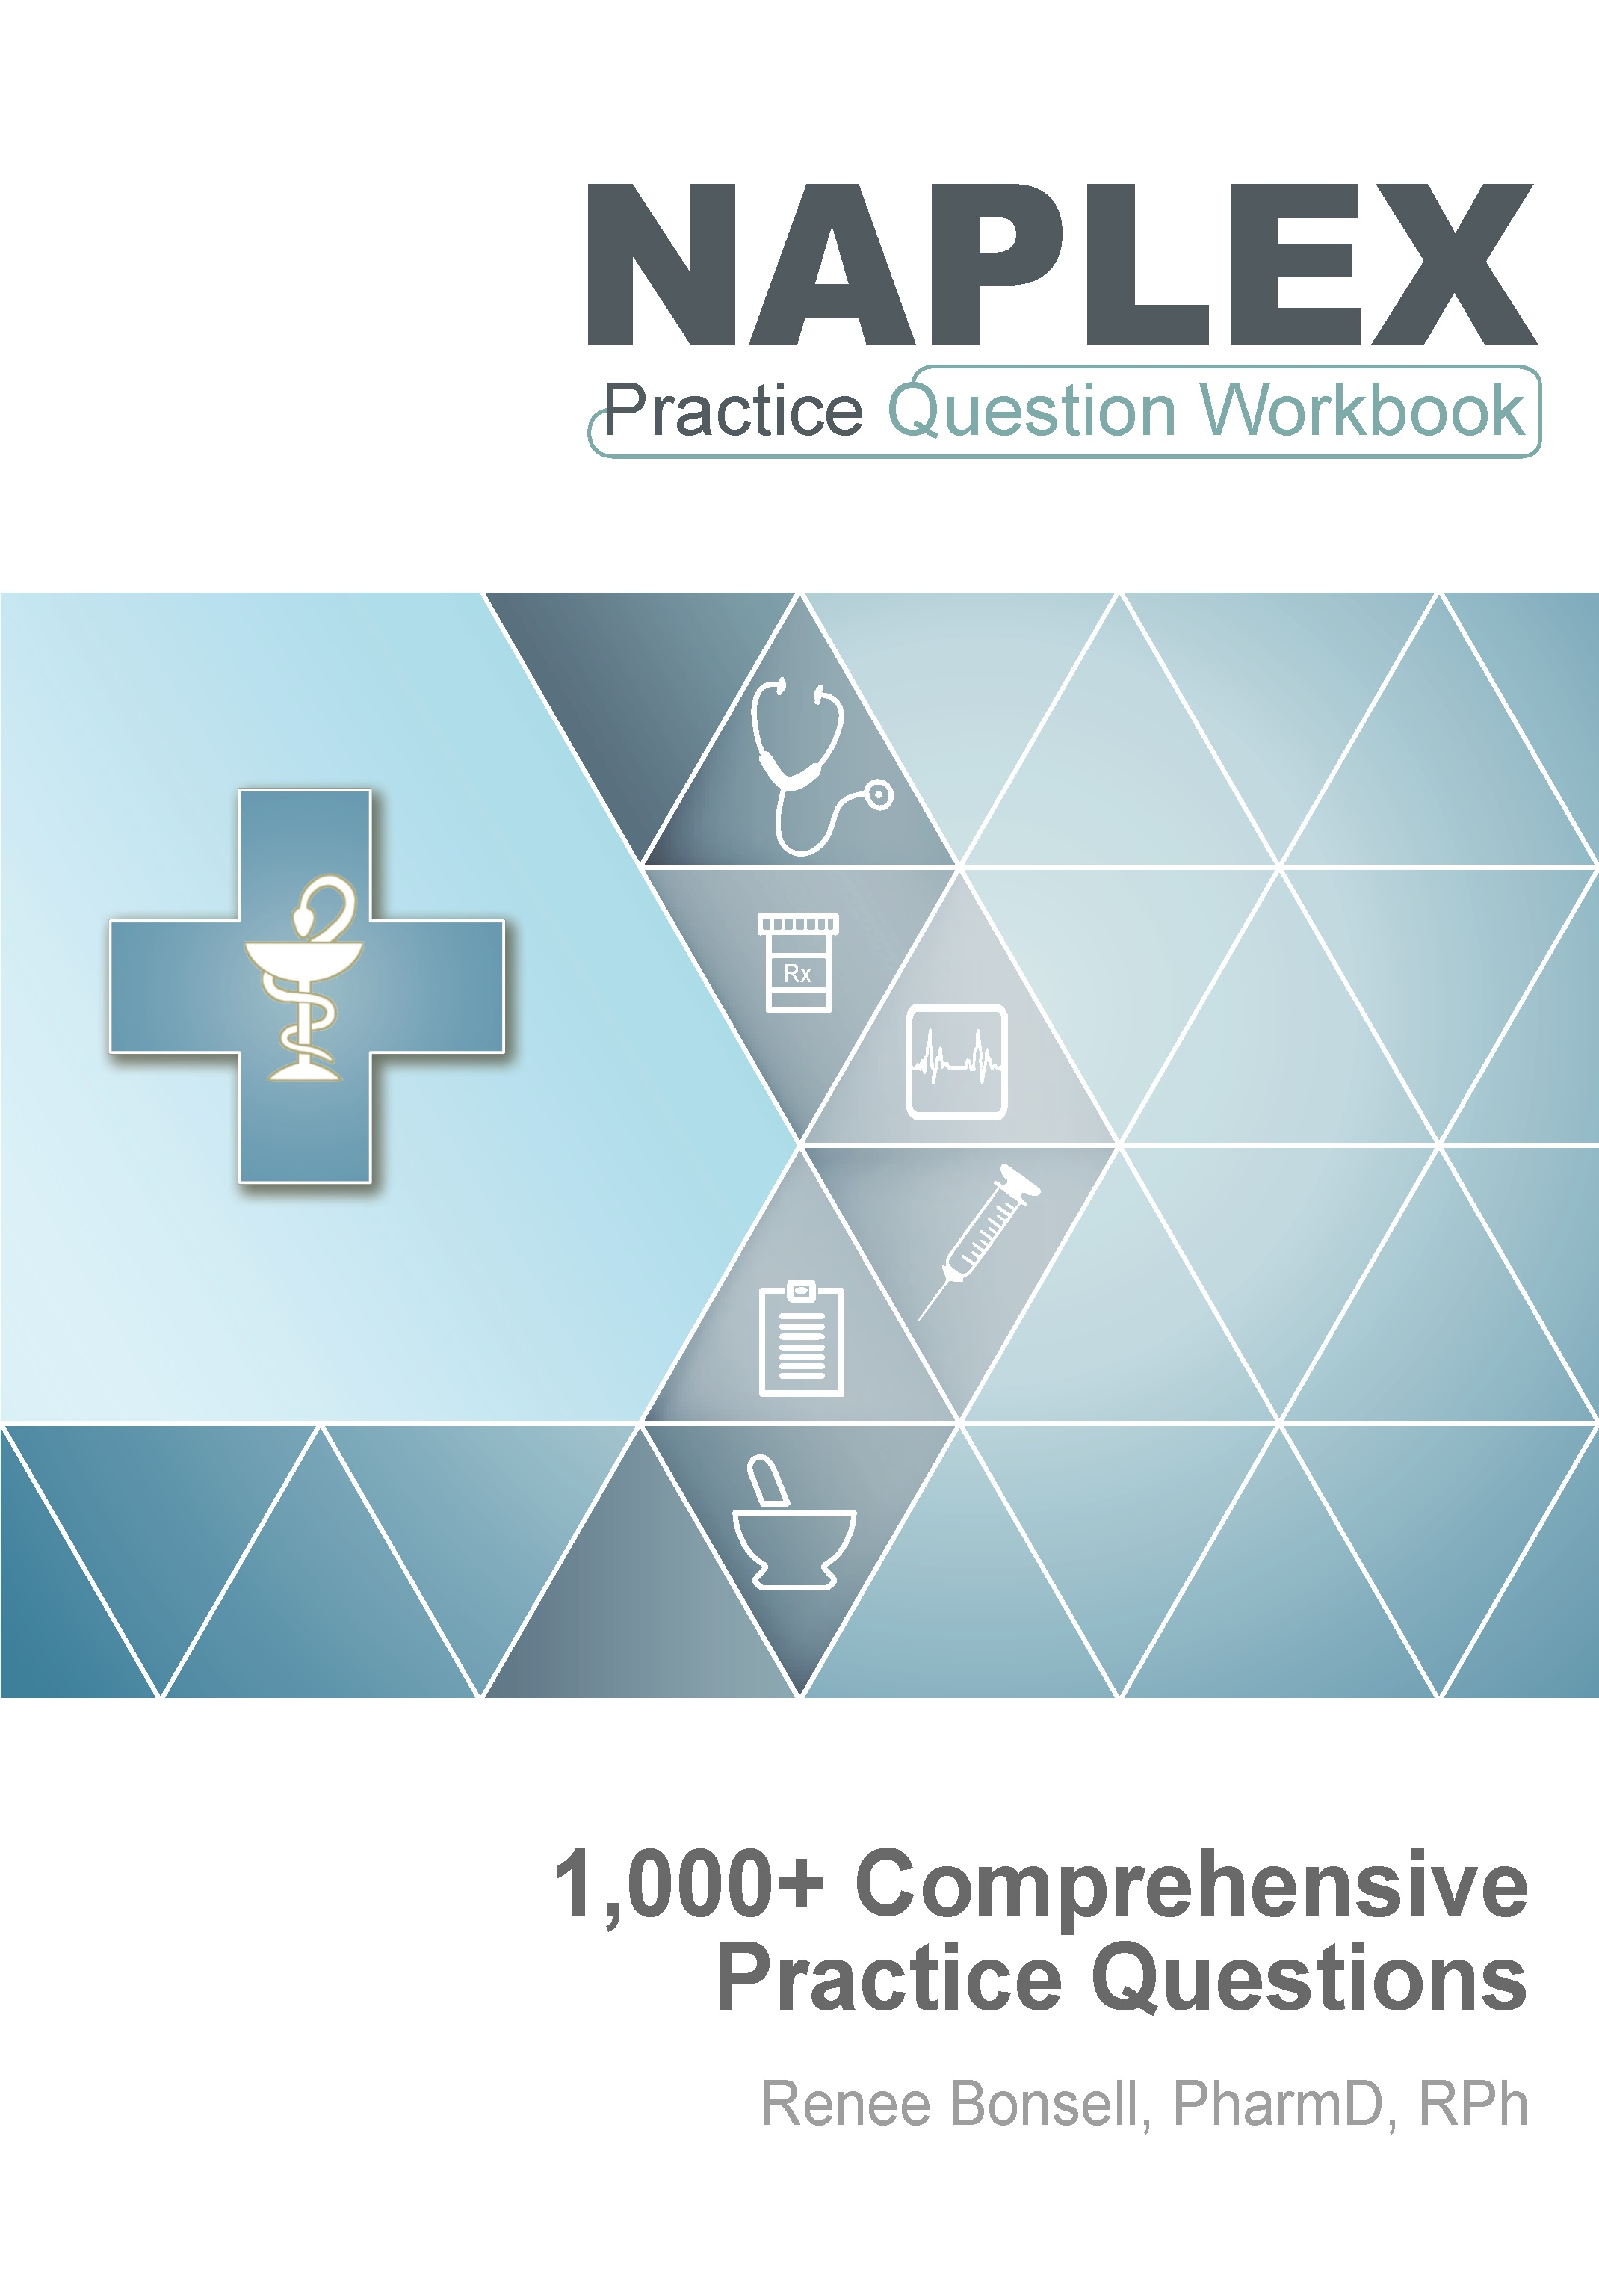 Naplex study guide array smashwords u2013 naplex practice question workbook 1000 comprehensive rh smashwords com malvernweather Image collections